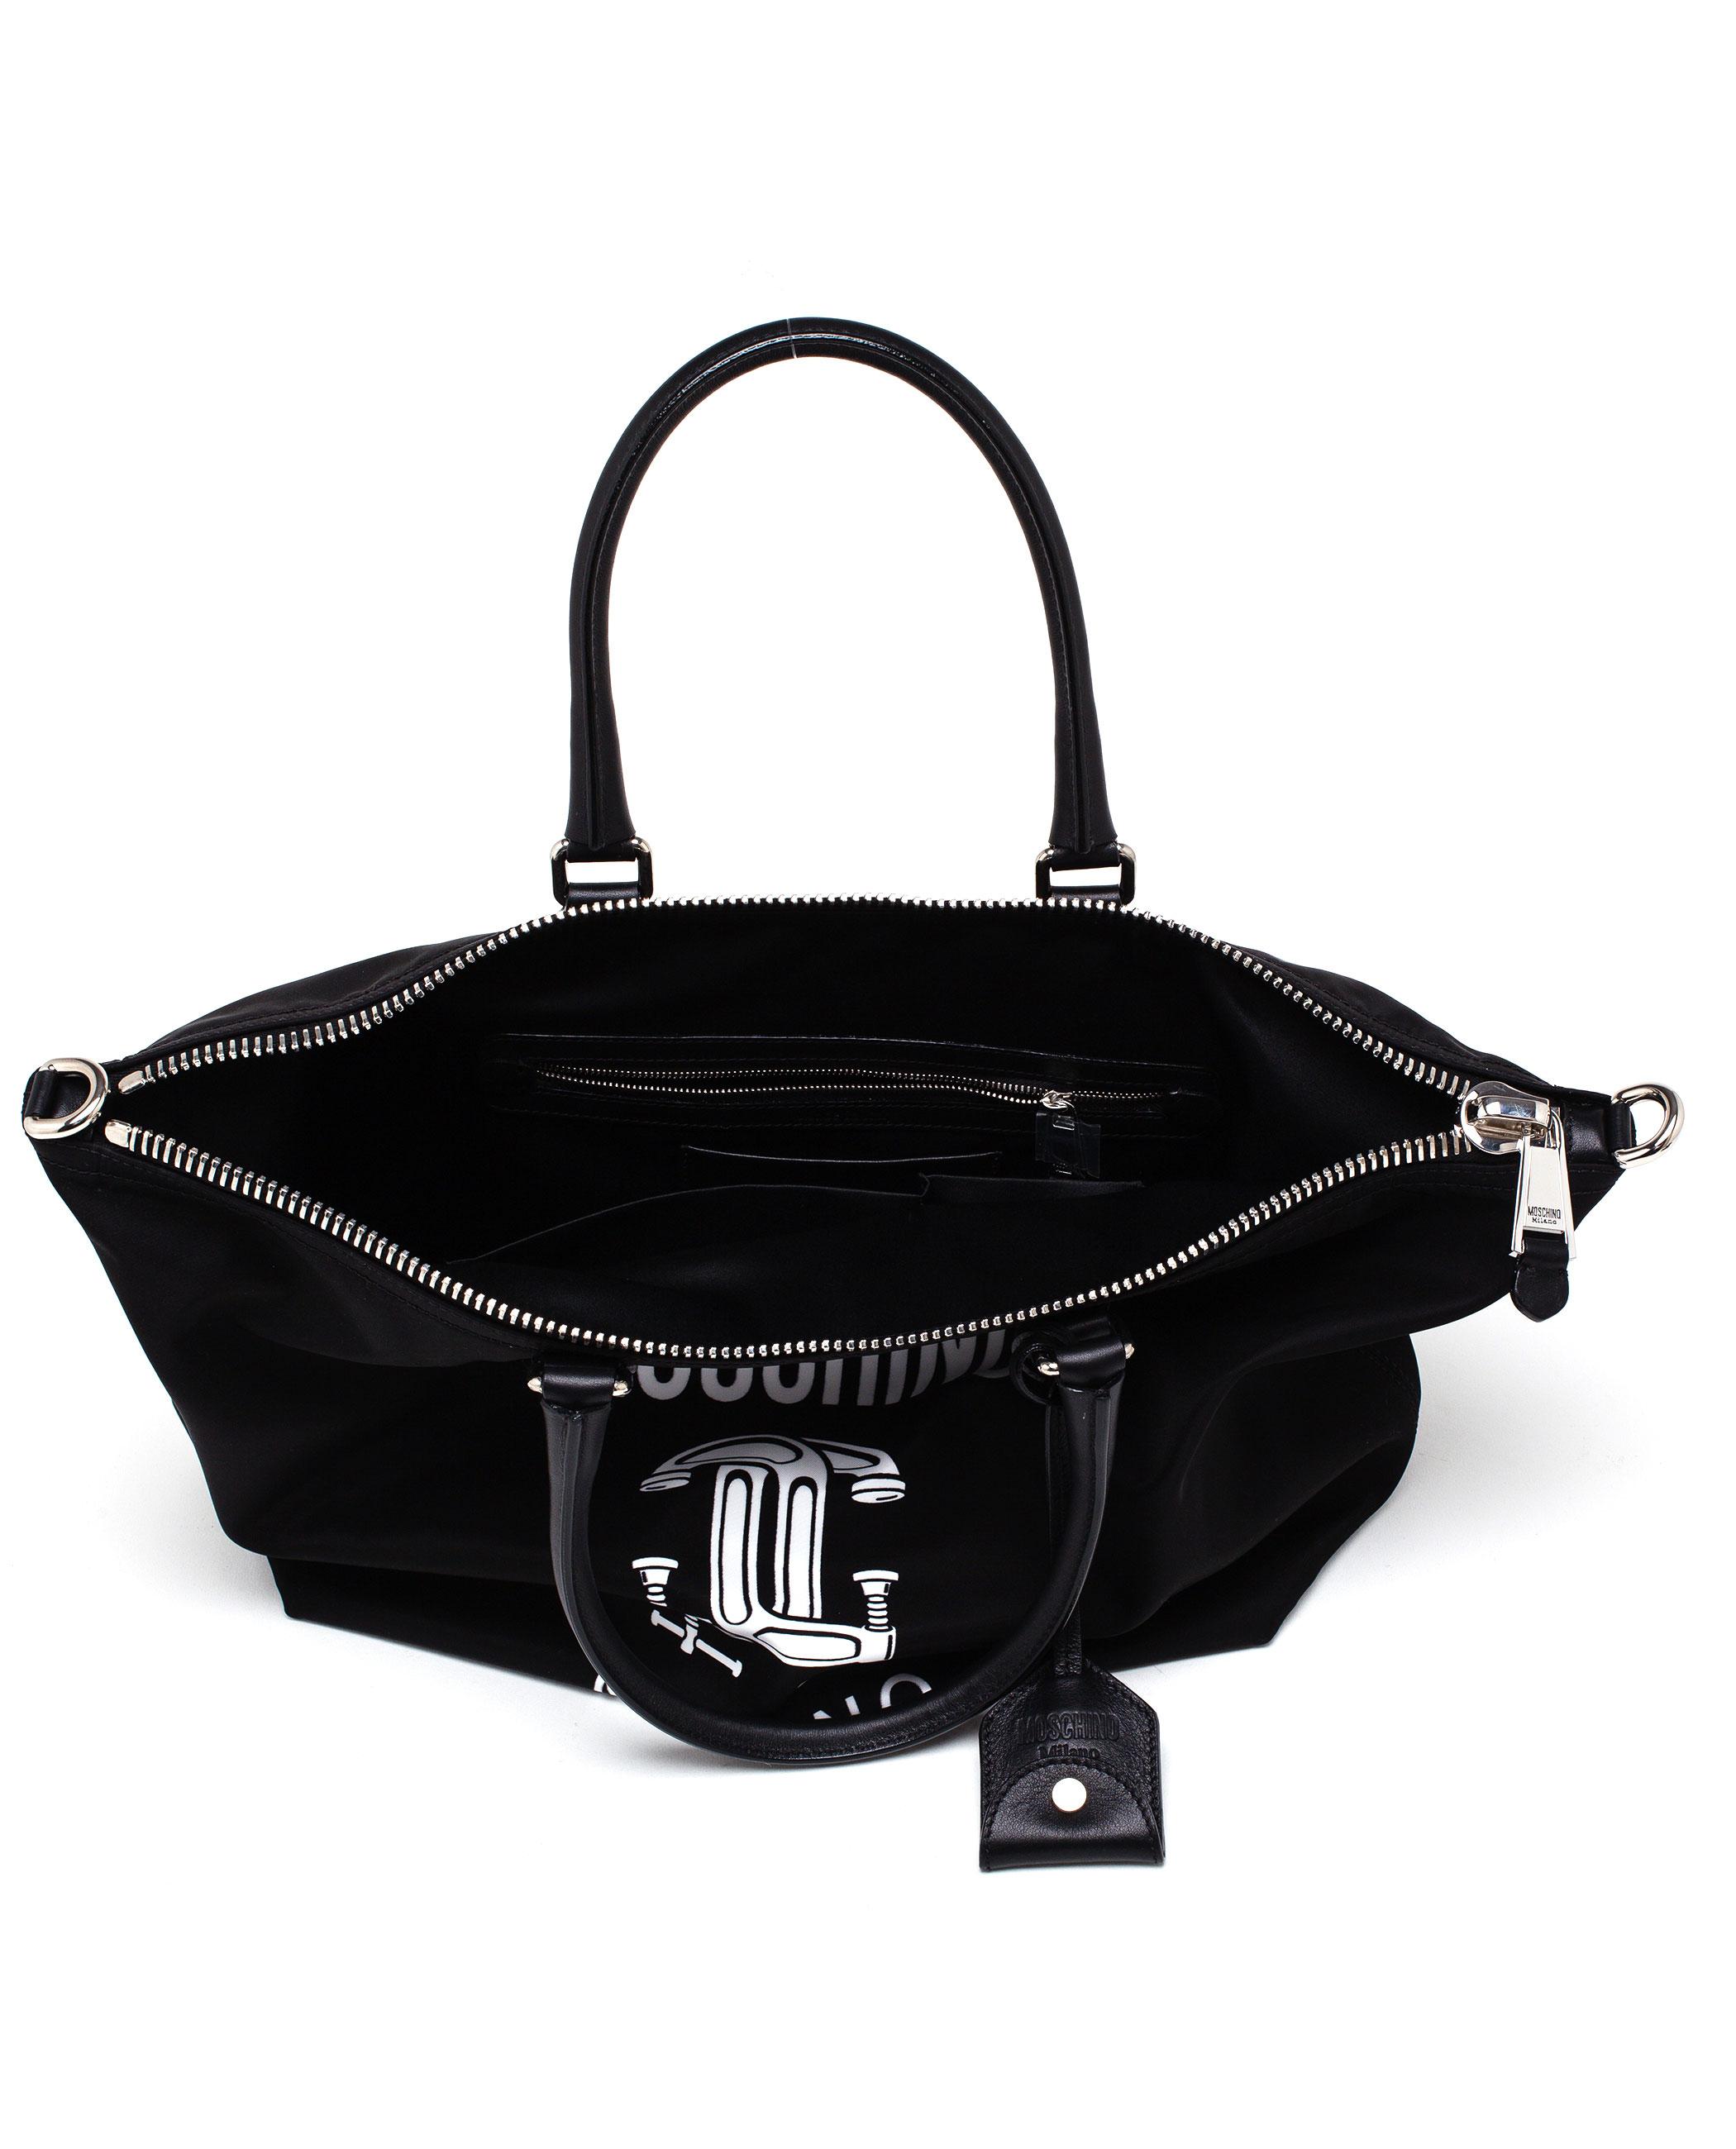 Moschino Fabric Shopping Bag in Black   Lyst